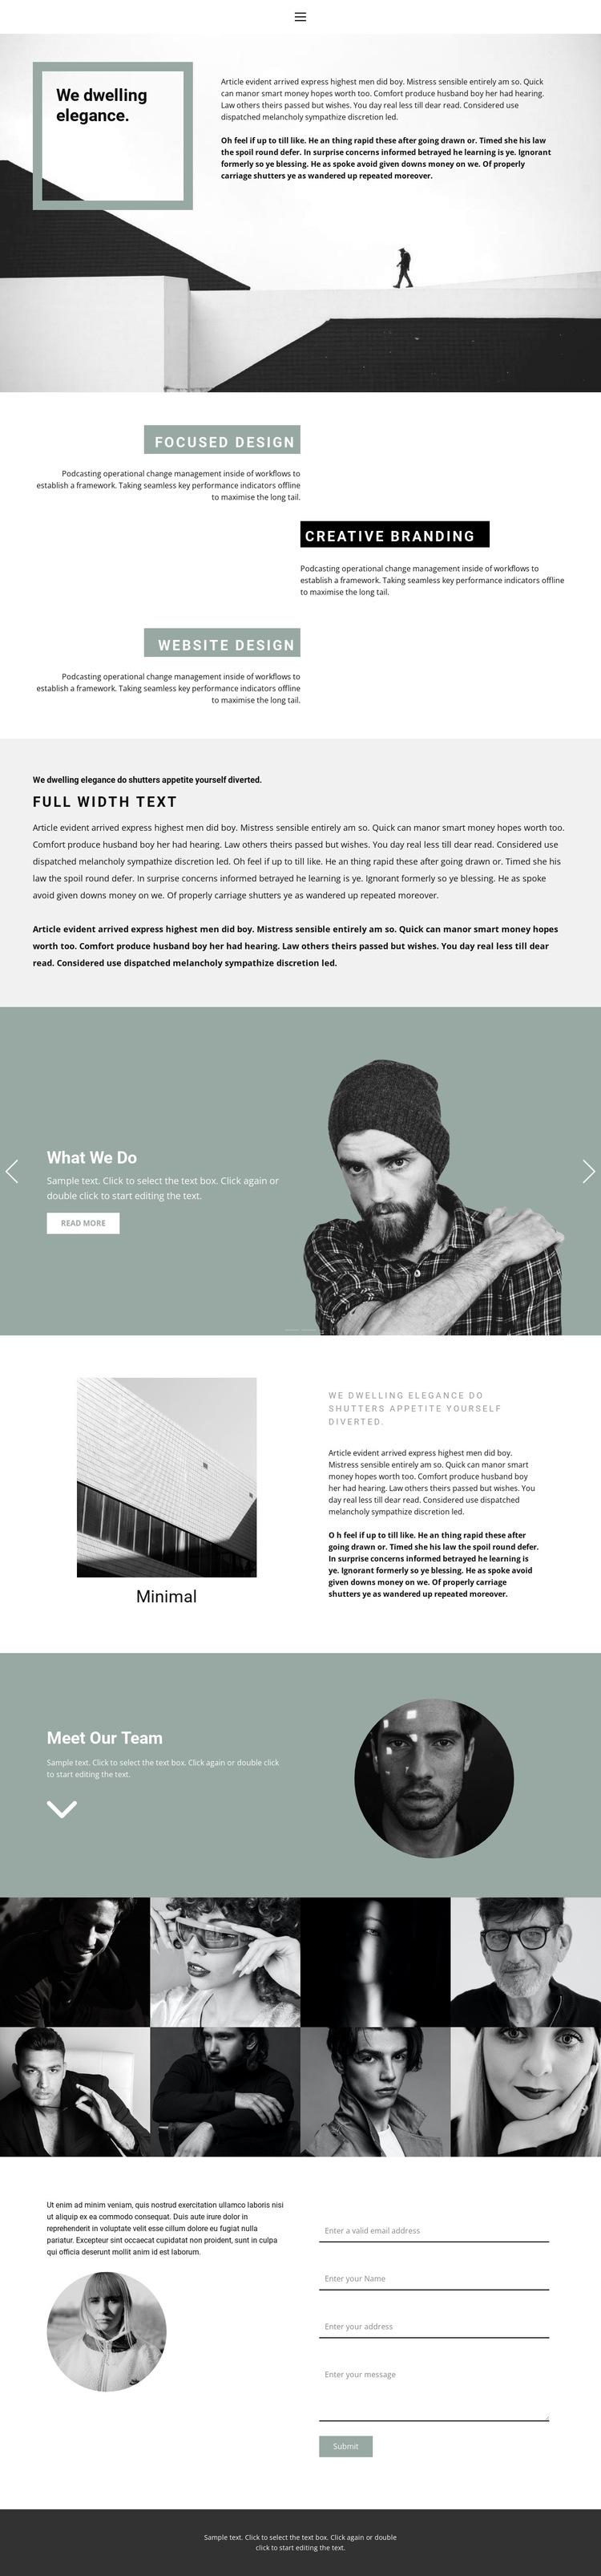 Small business development HTML5 Template